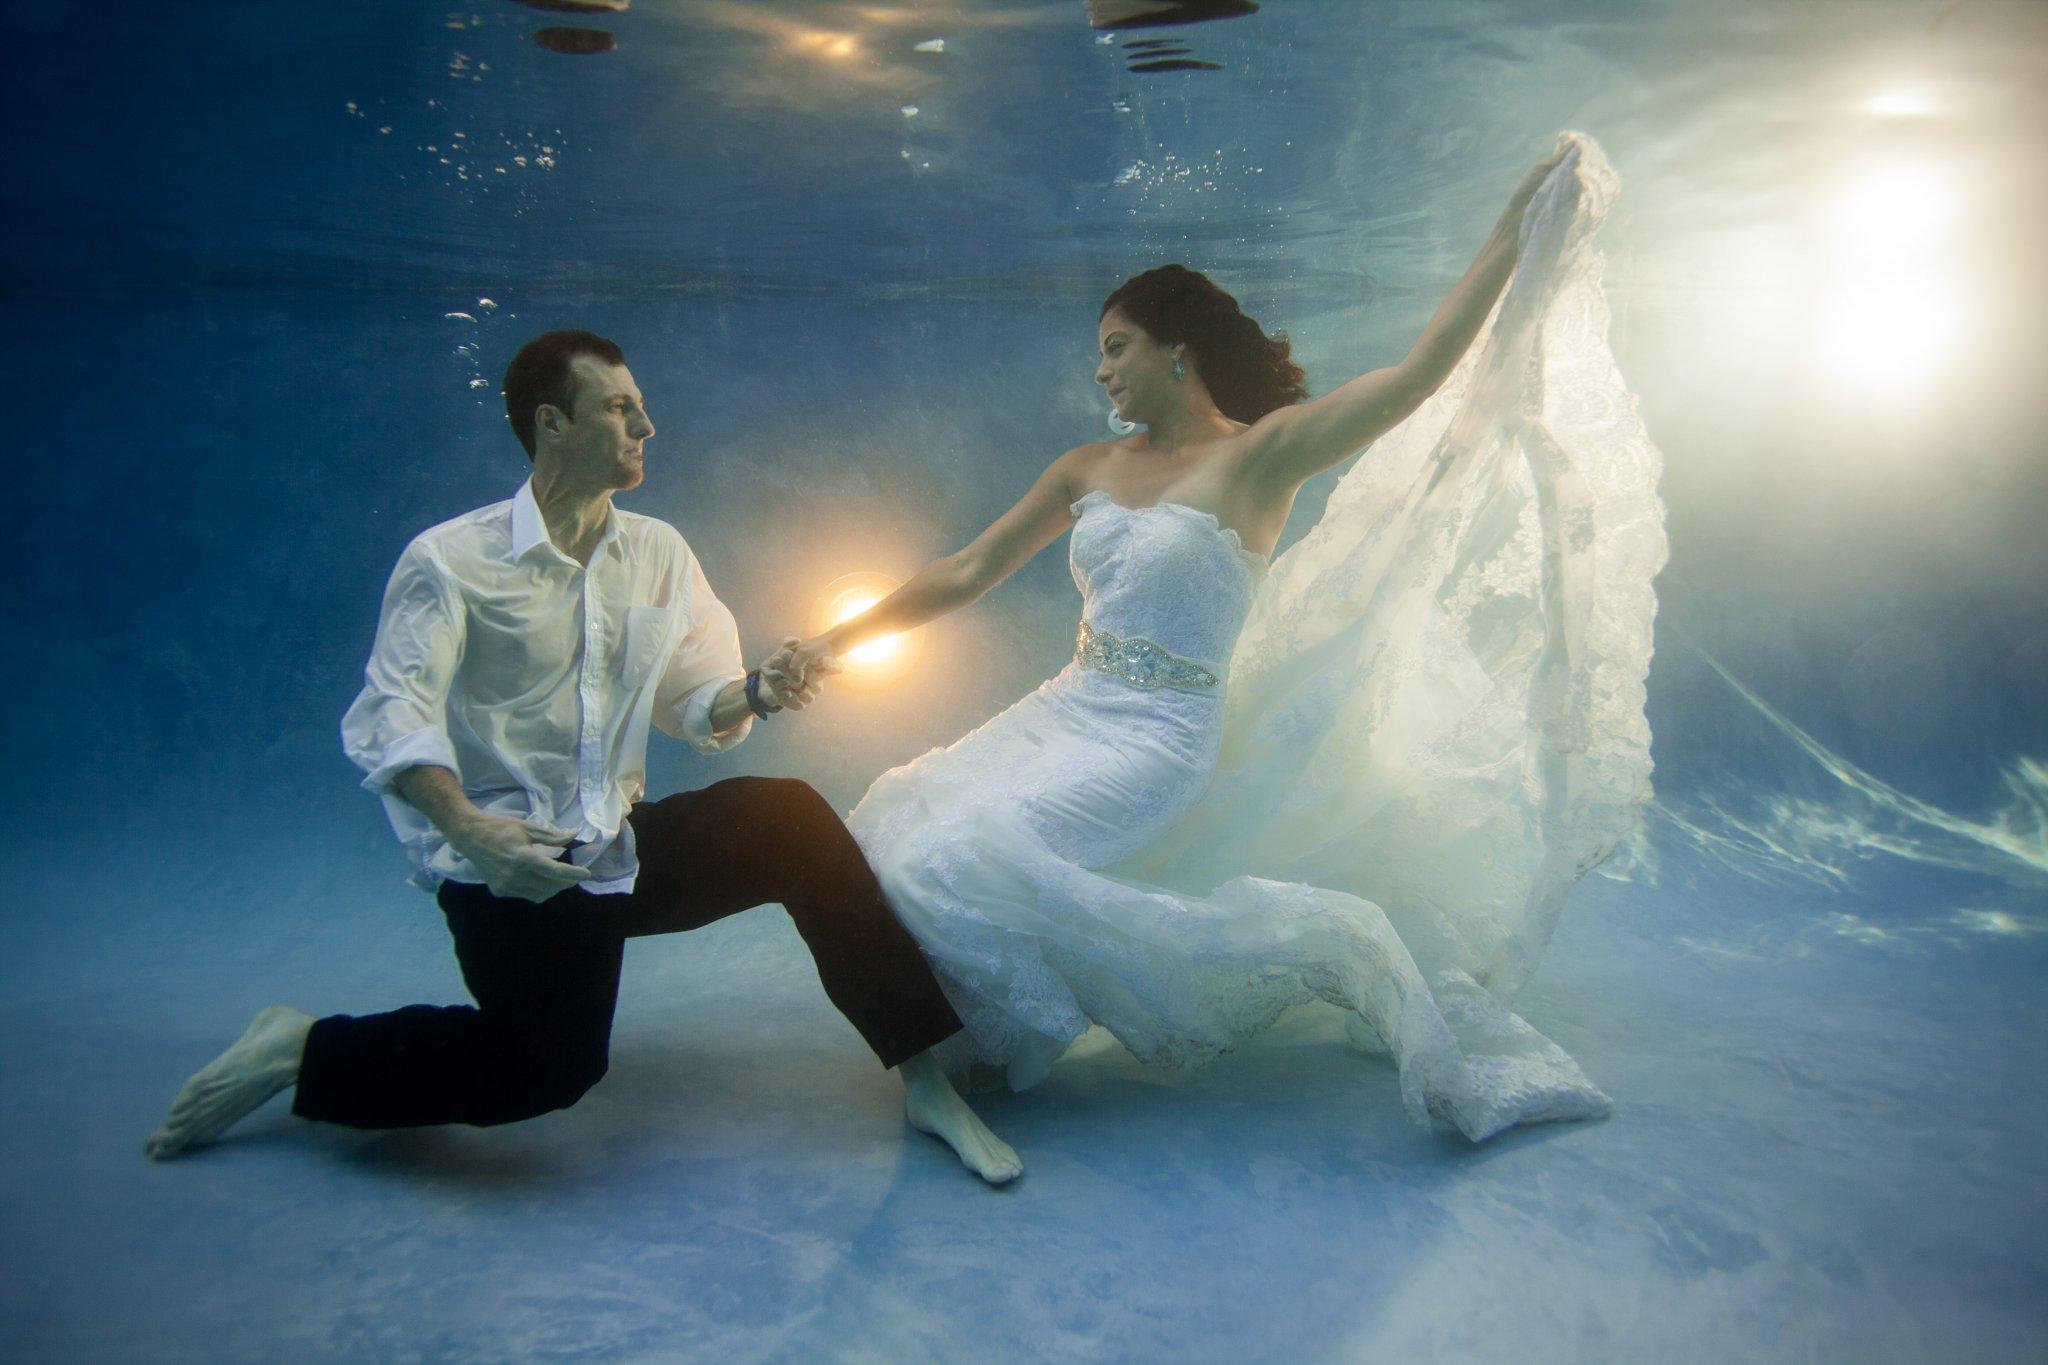 underwater trash the wedding dress in a pool Arizona